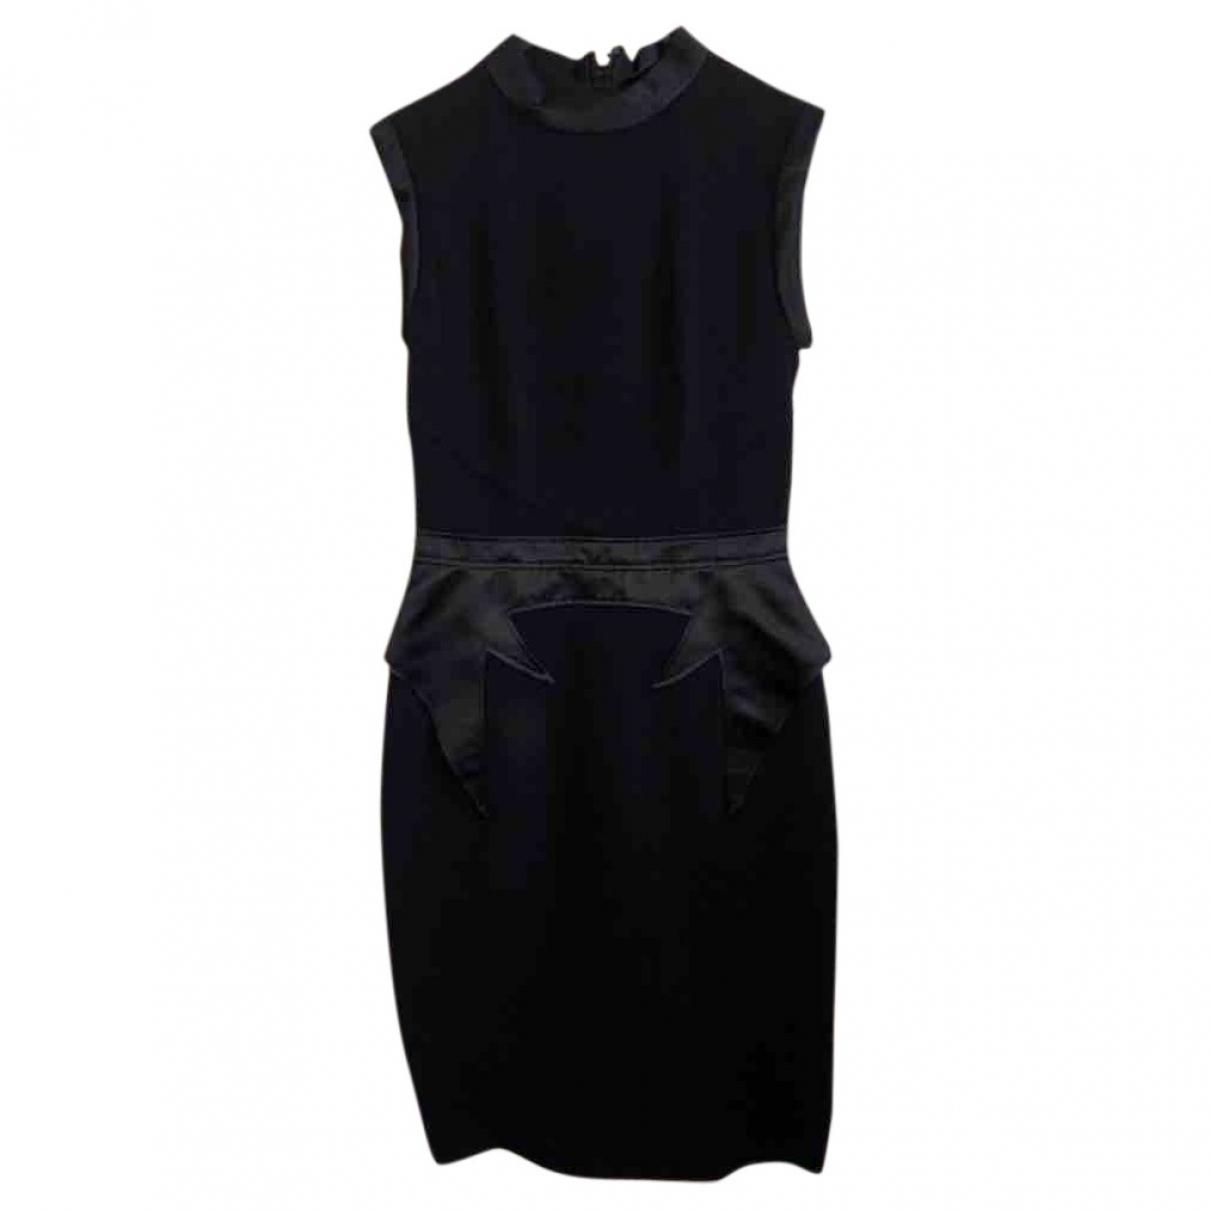 Givenchy \N Black Wool dress for Women 36 FR